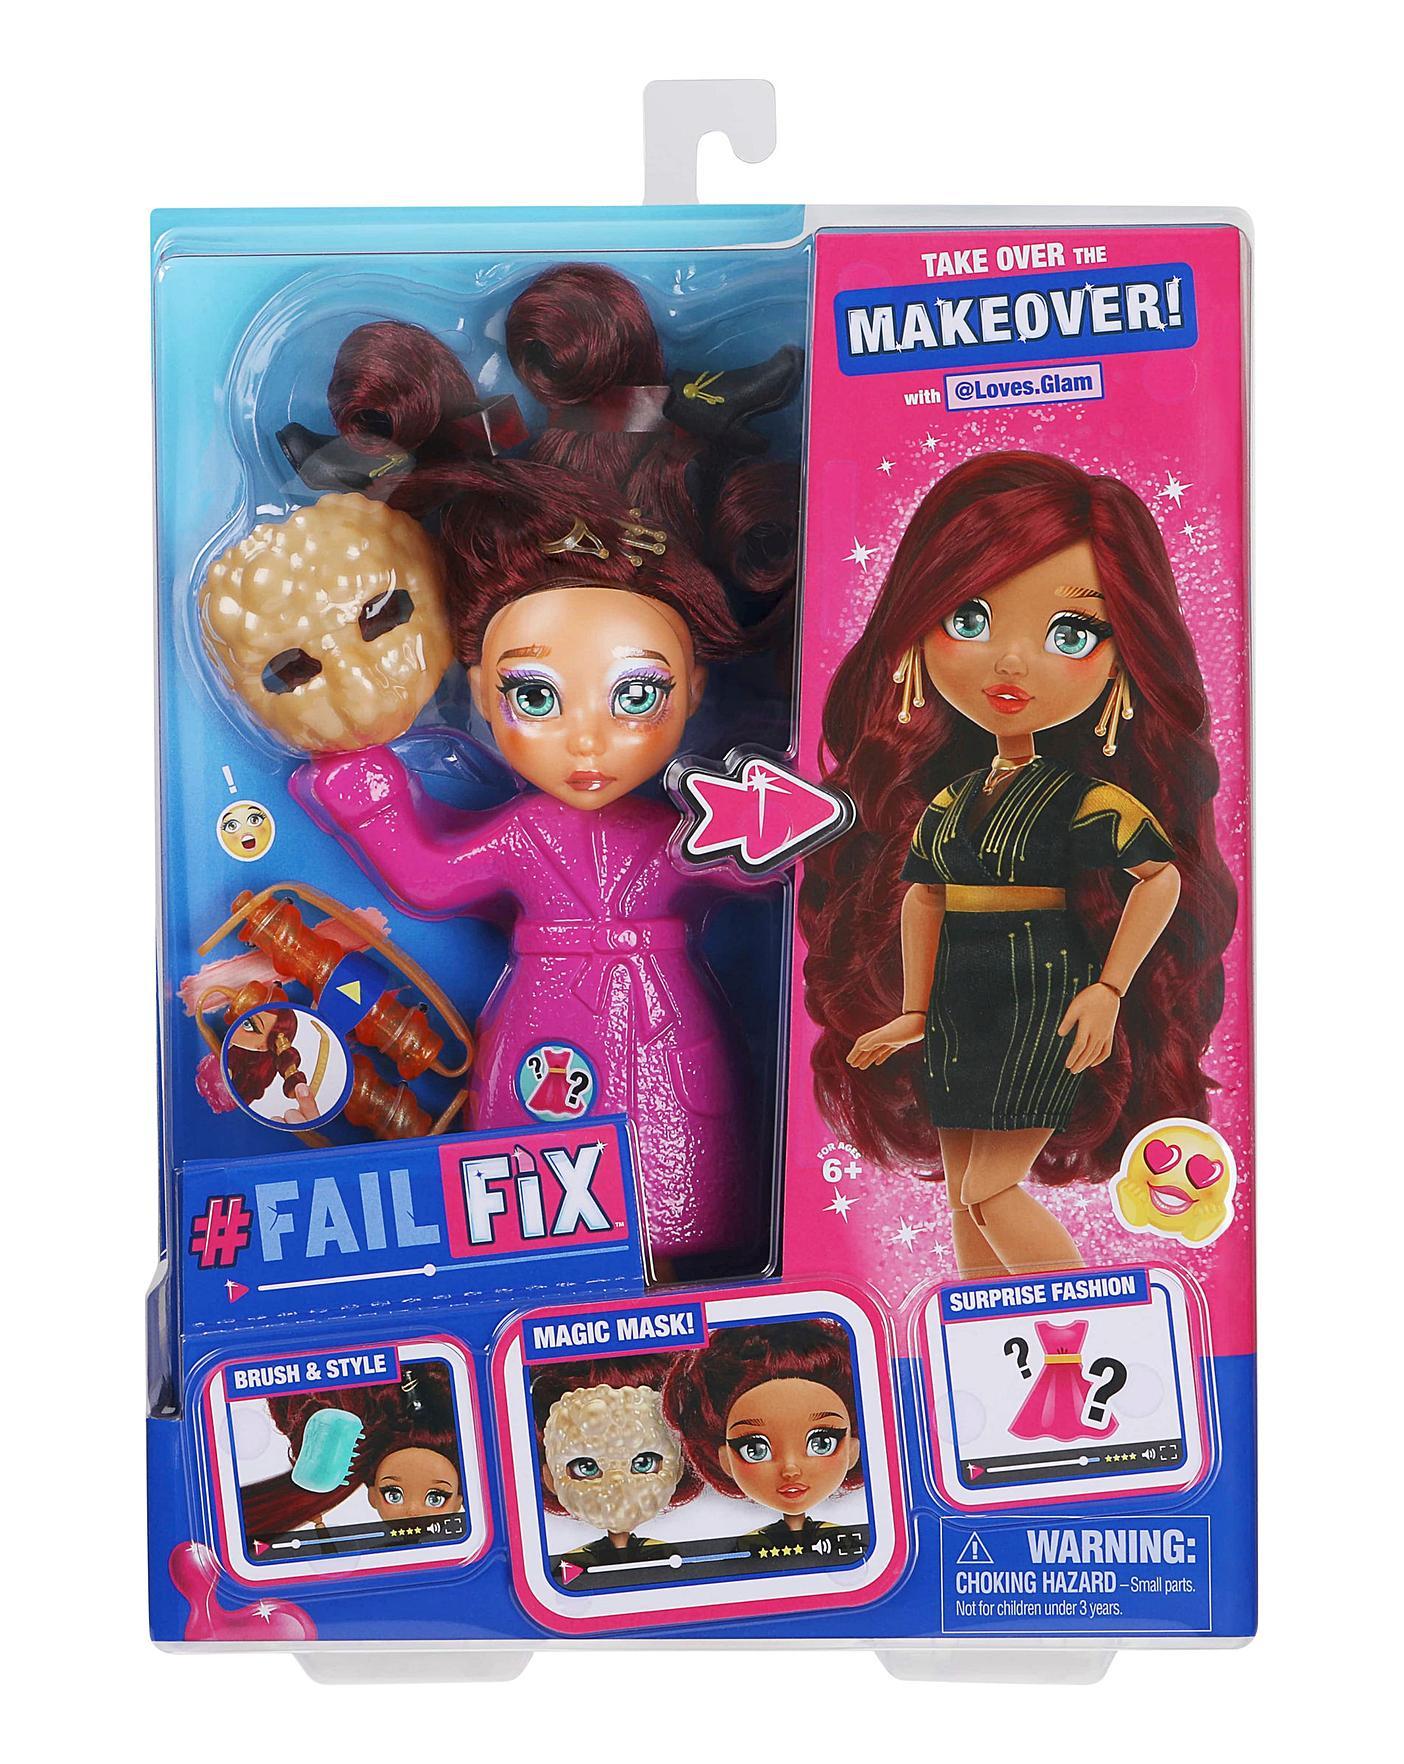 Failfix Total Makeover Glamazongirl Doll Home Essentials